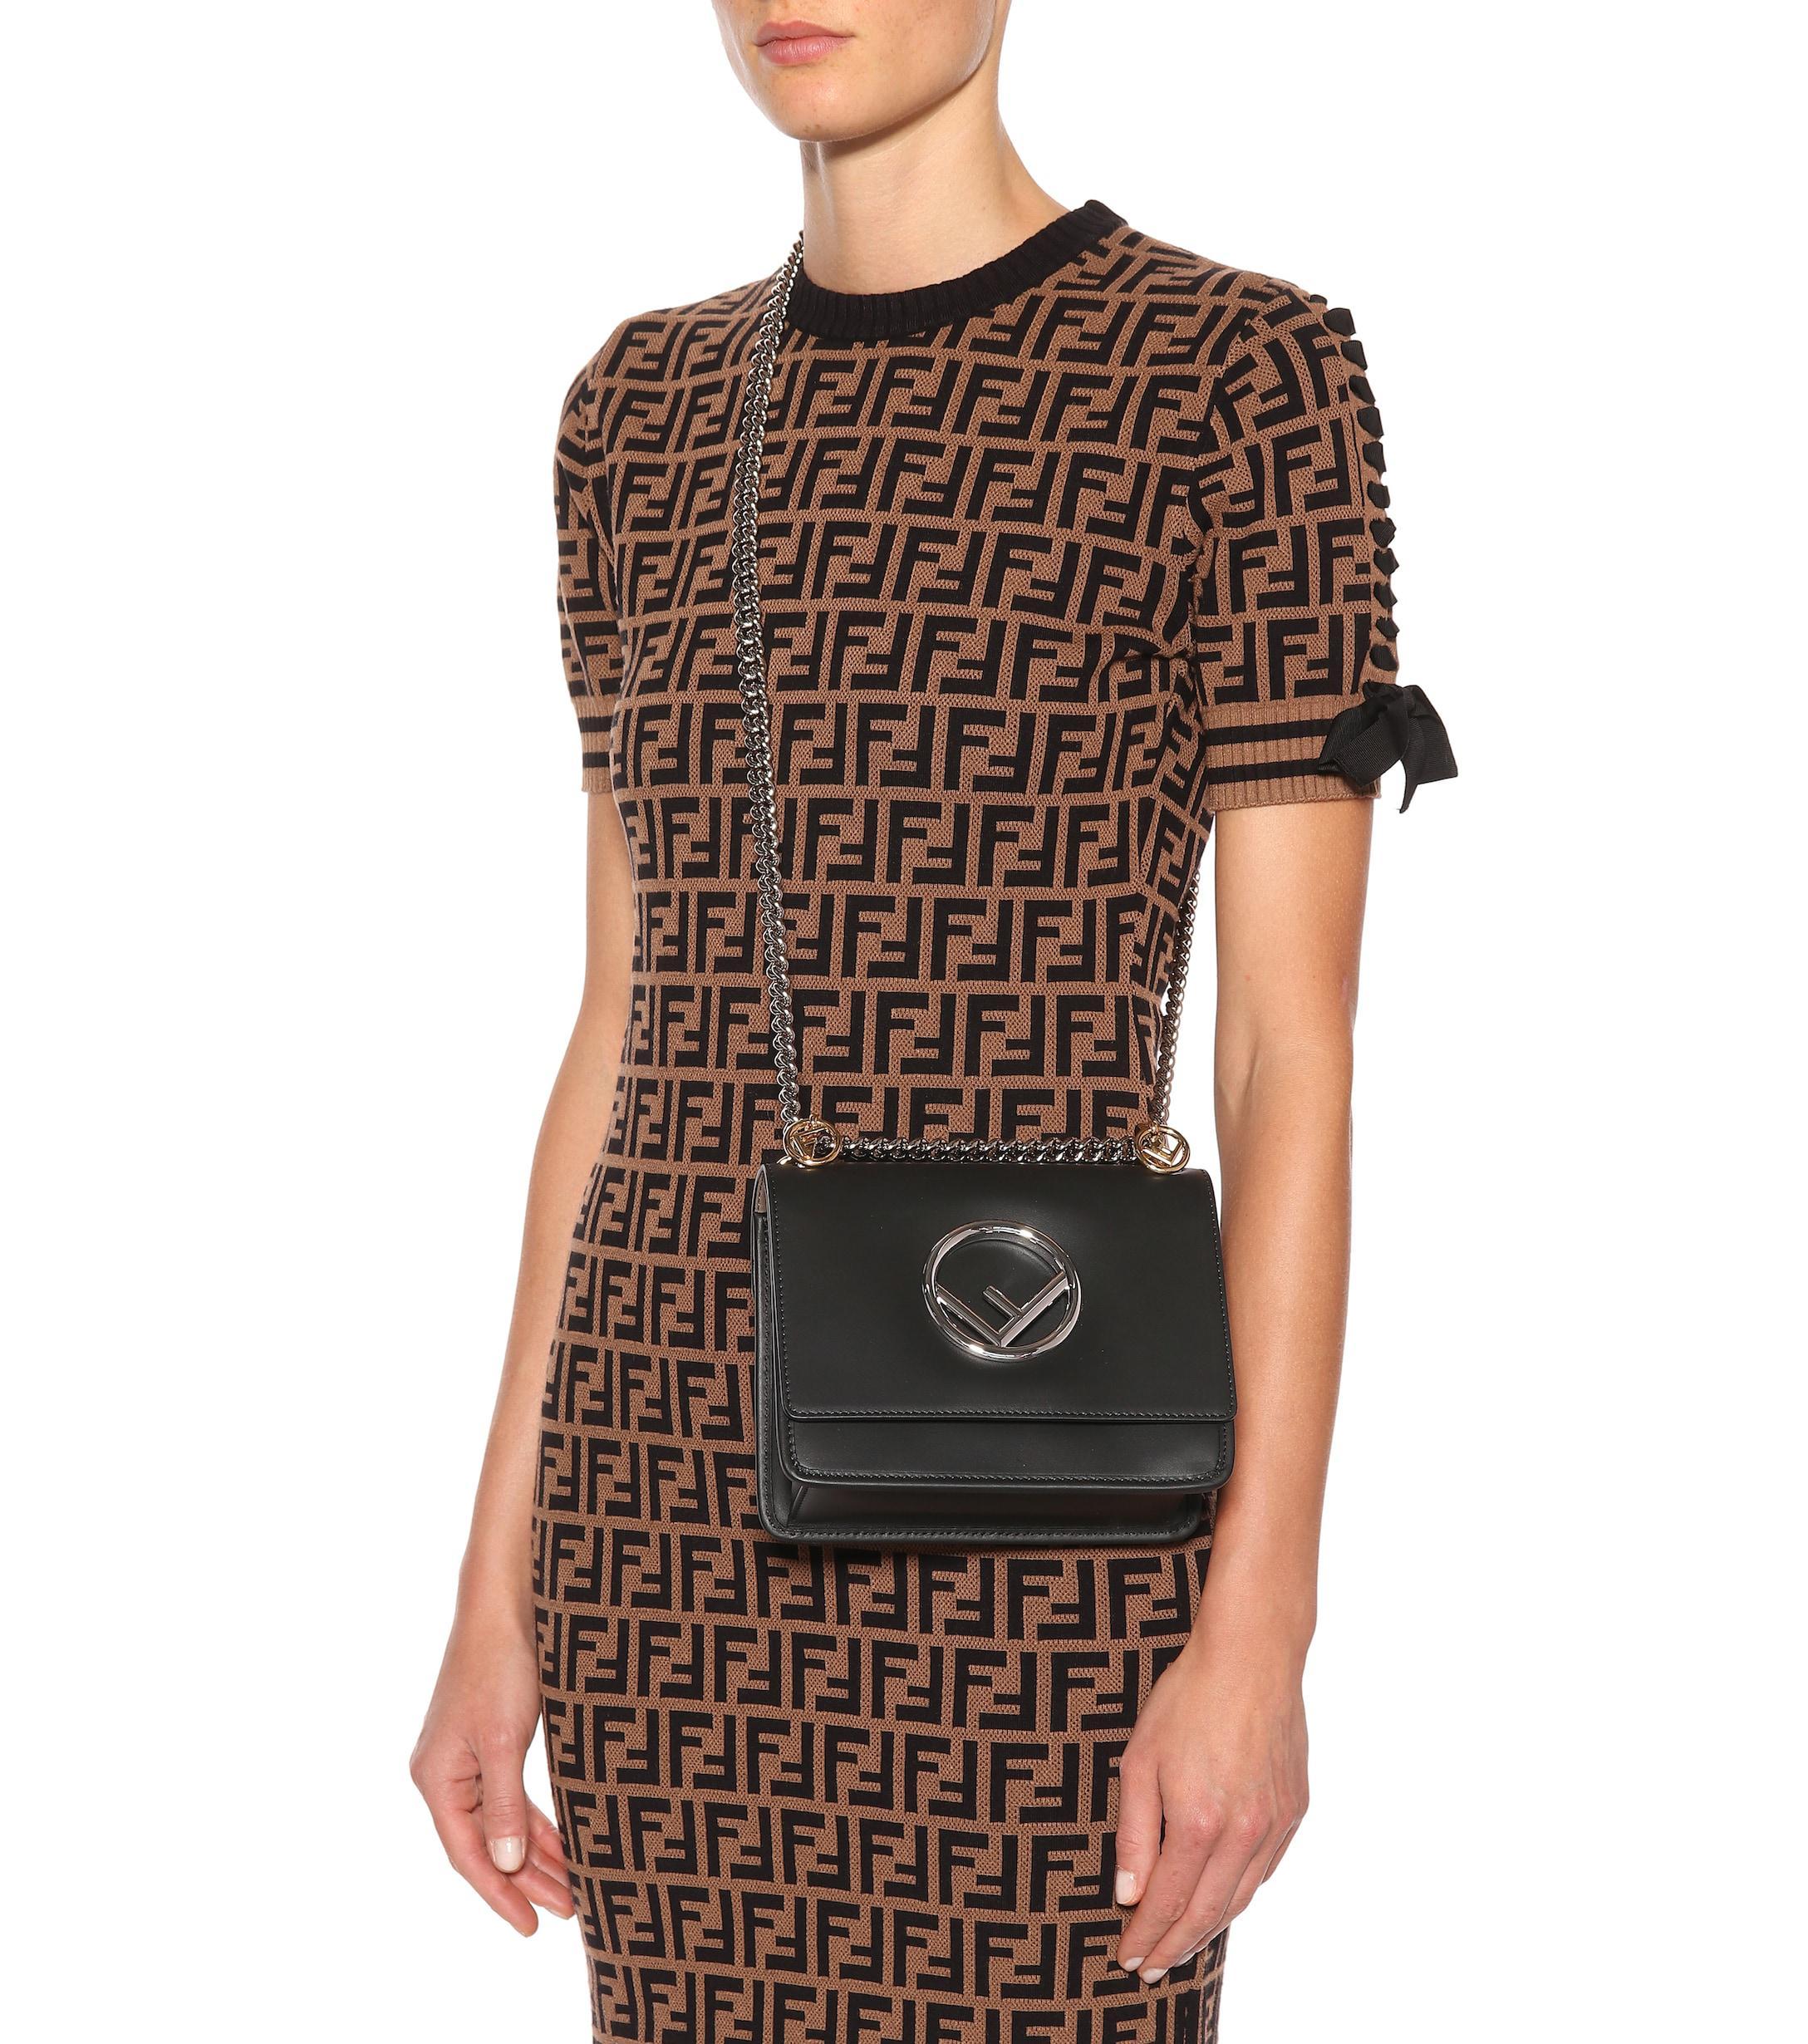 6e038d23eed Fendi - Black Kan I F Small Leather Shoulder Bag - Lyst. View fullscreen